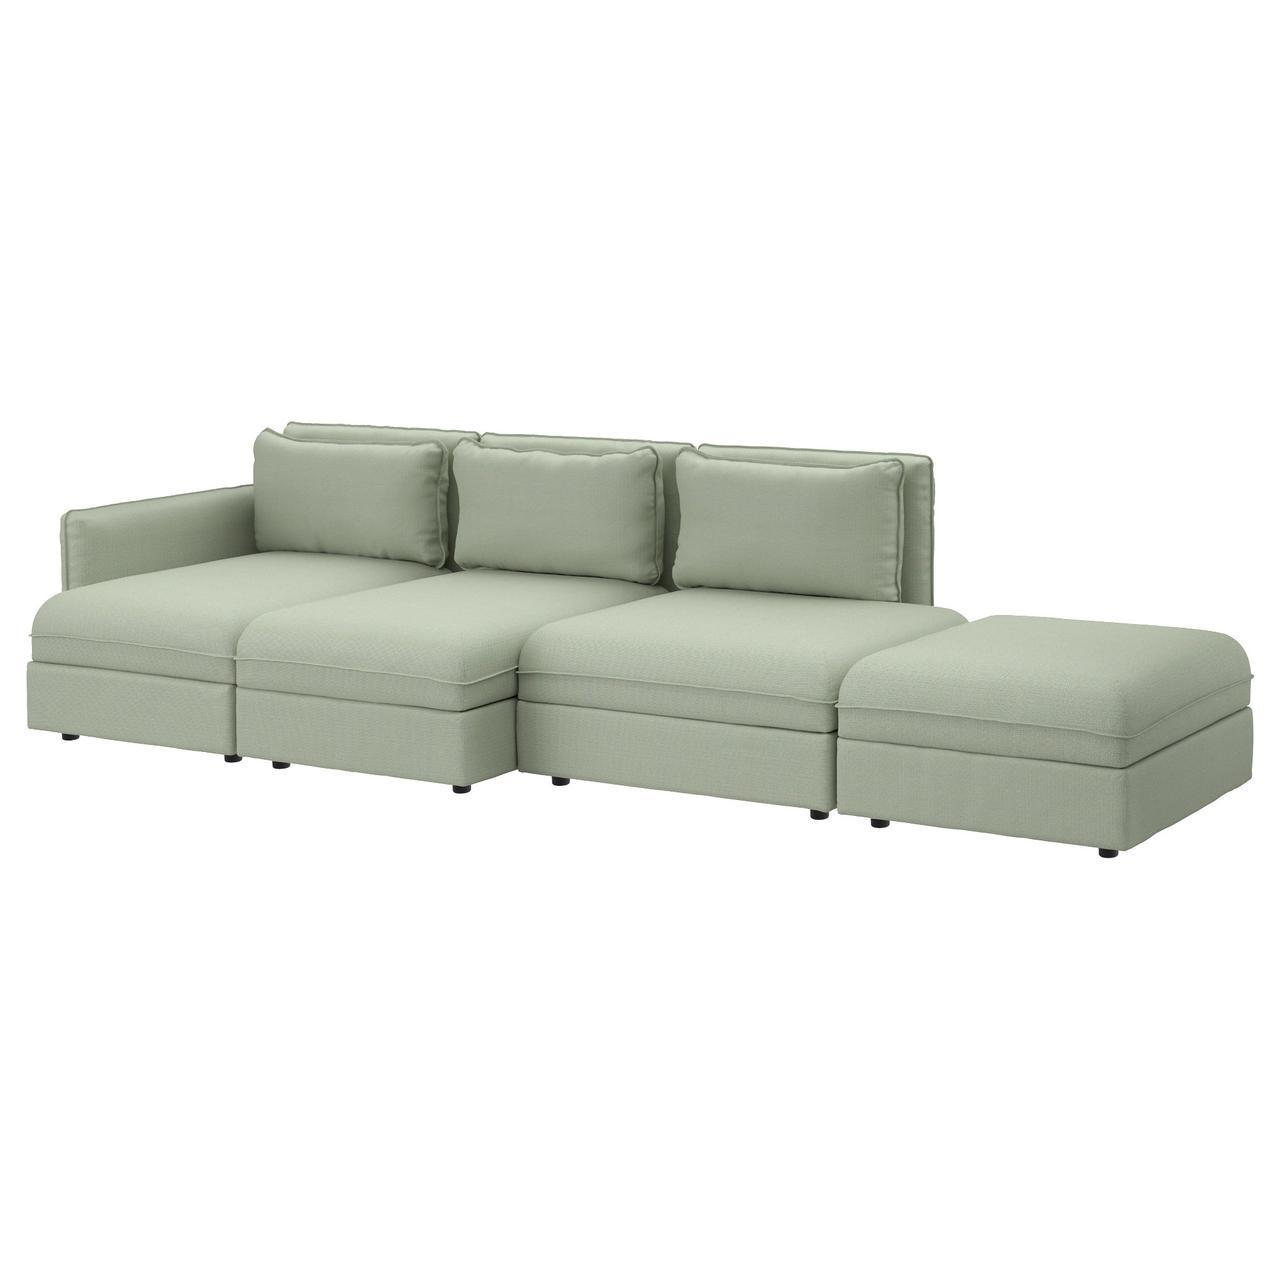 IKEA VALLENTUNA (391.497.50) Диван, 4 части, Orrsta светло-серый